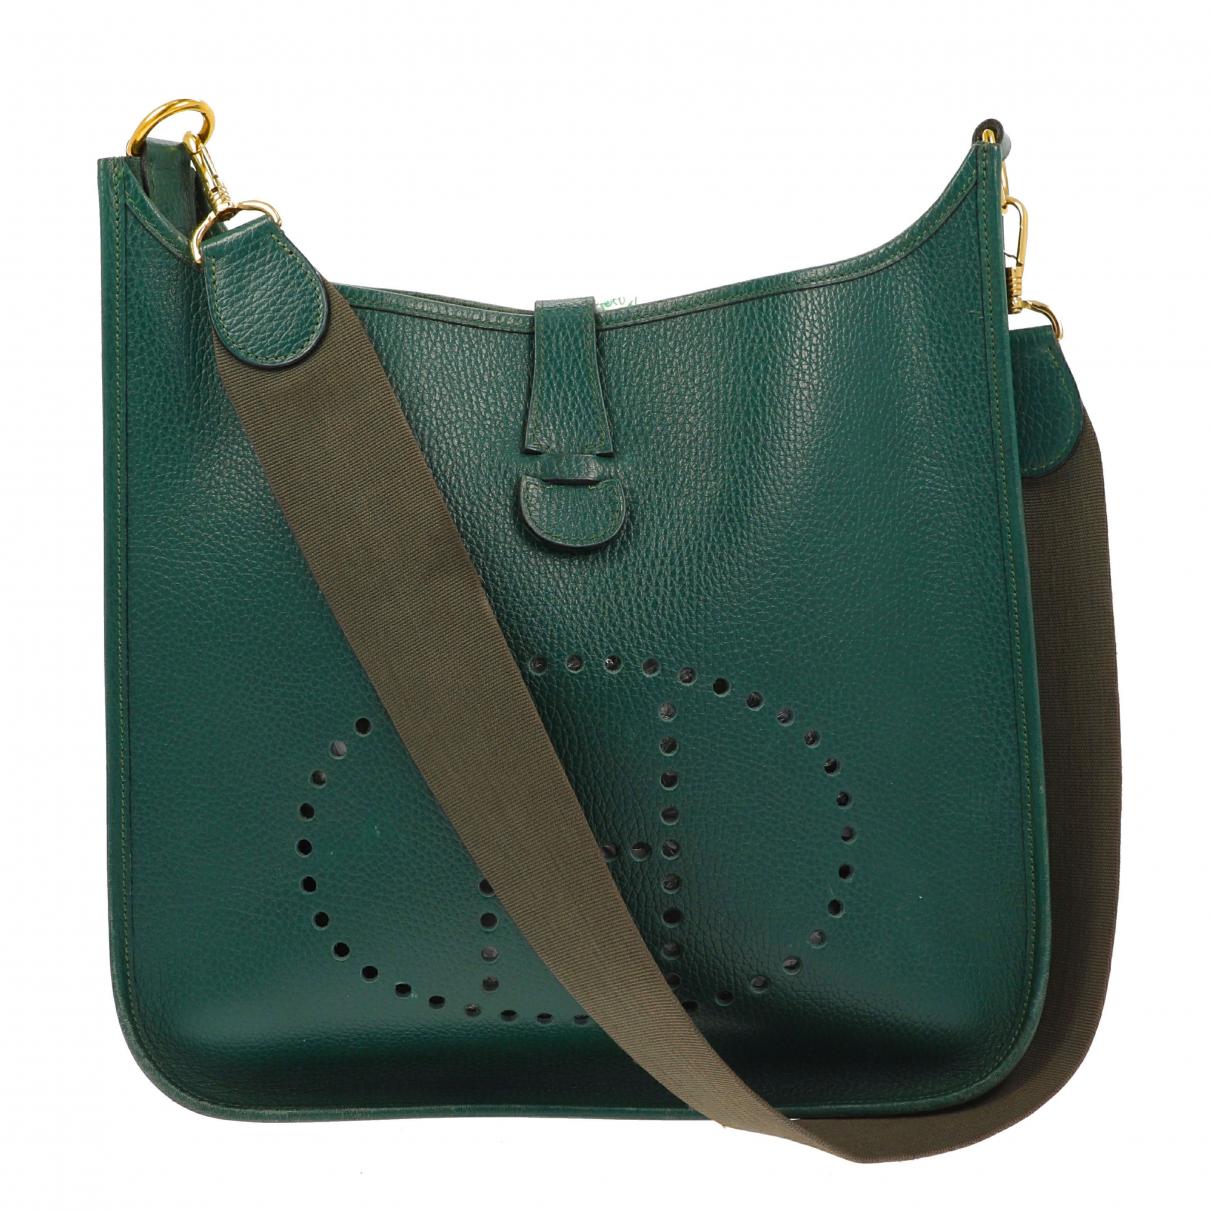 Hermès \N Green Leather handbag for Women \N